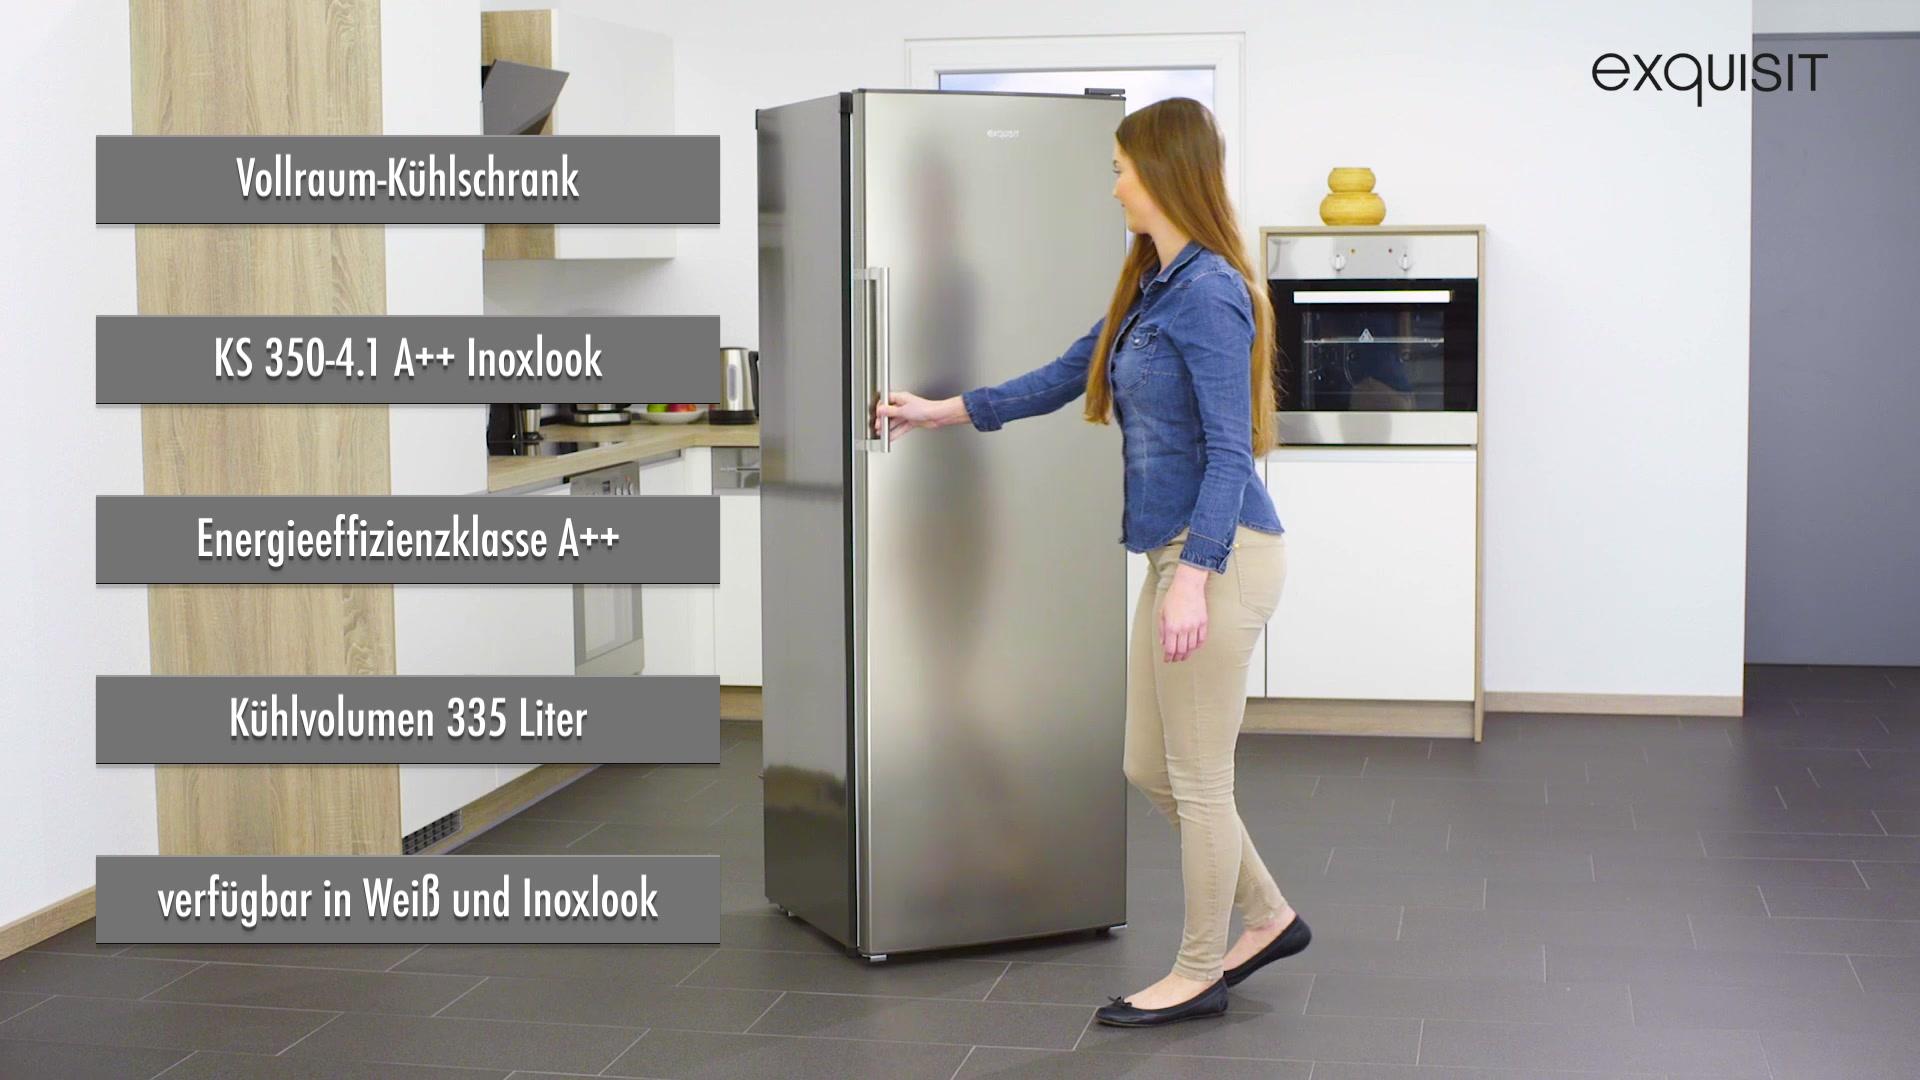 Kühlschrank Exquisit : Exquisit kühlschrank ks a a cm hoch